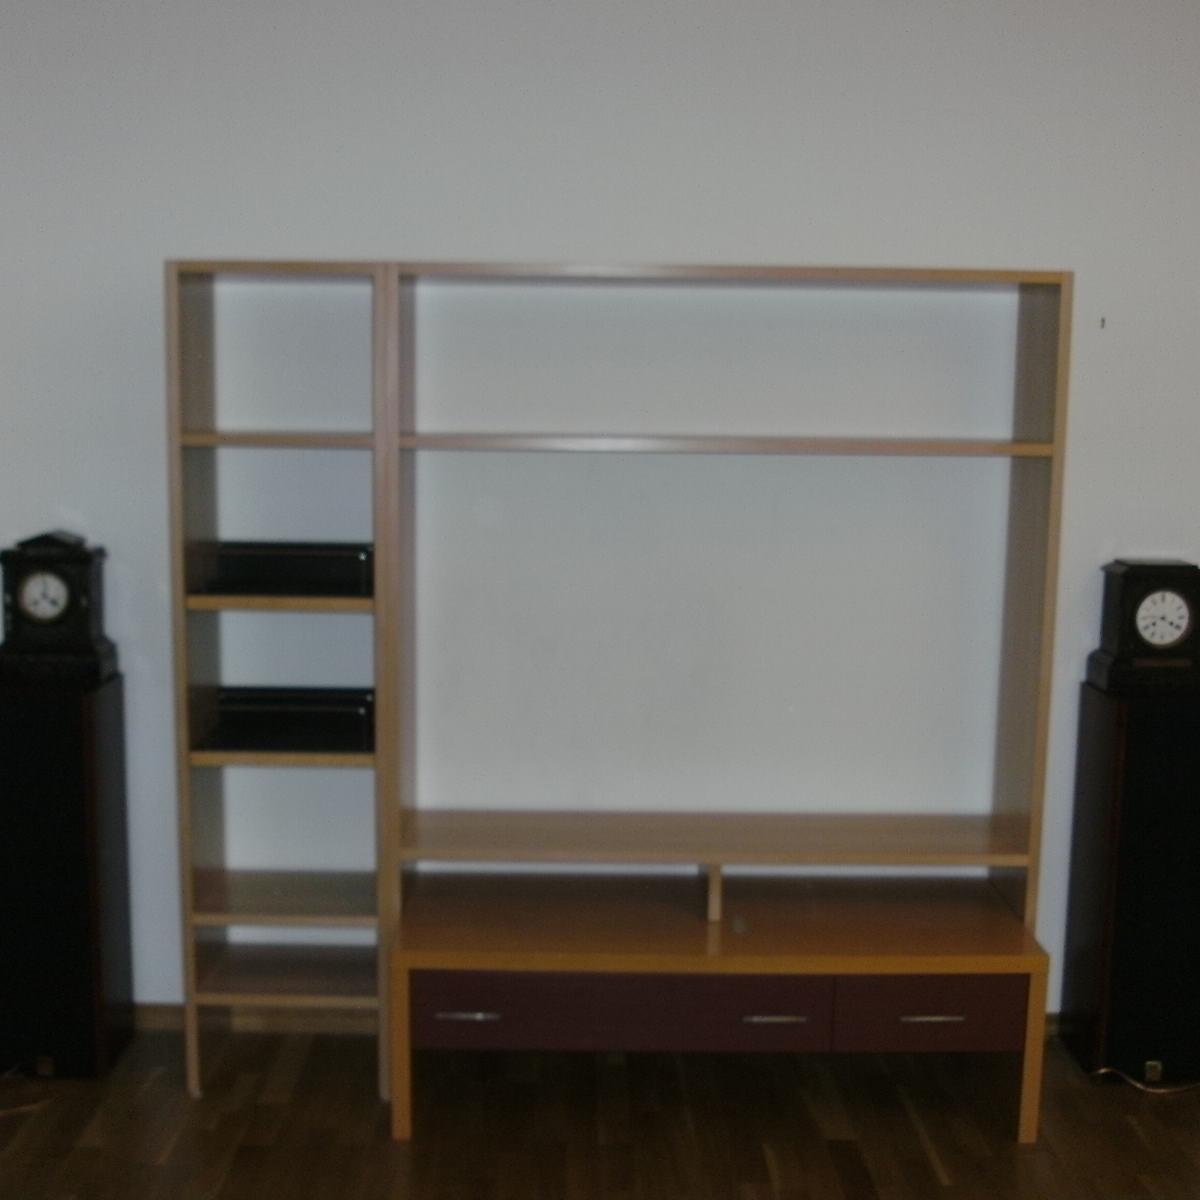 Technikmöbel, Flat, Hifi, CD-Auszüge, 26mm Buchefurnierplatte, lackiert